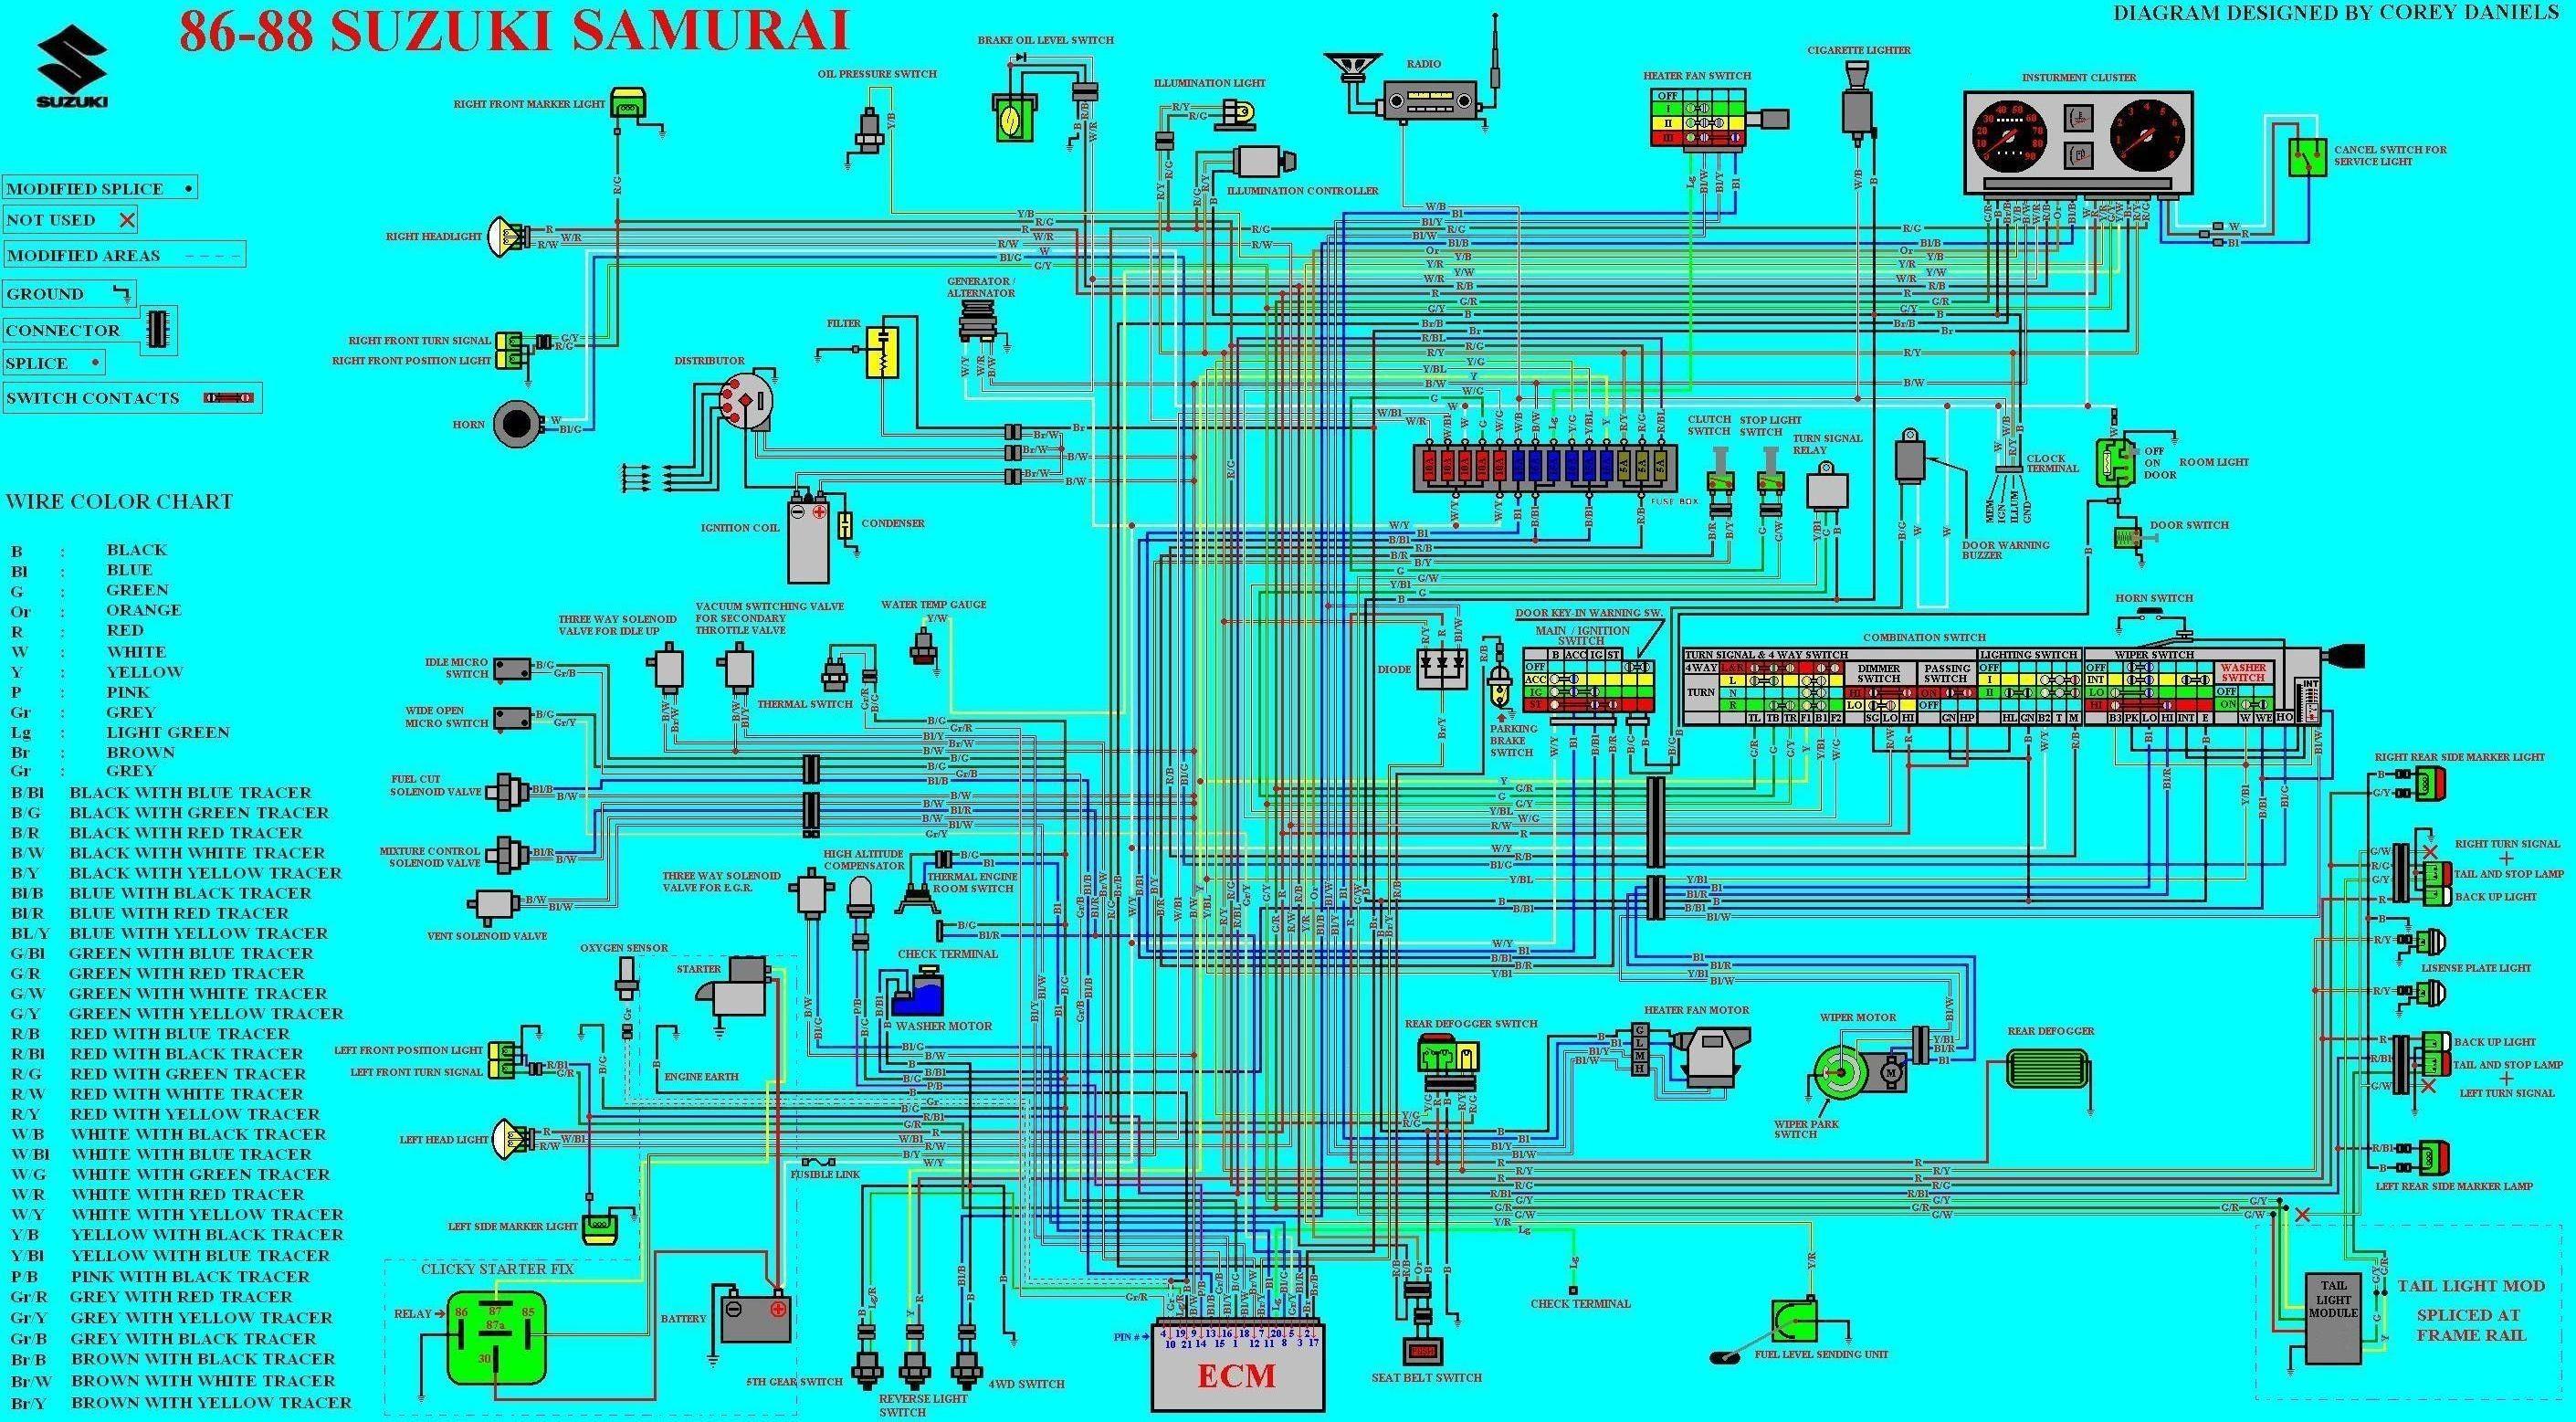 Suzuki Samurai Alternator Wiring Diagram In 2021 Suzuki Samurai Alternator Wiring Diagram Alternator